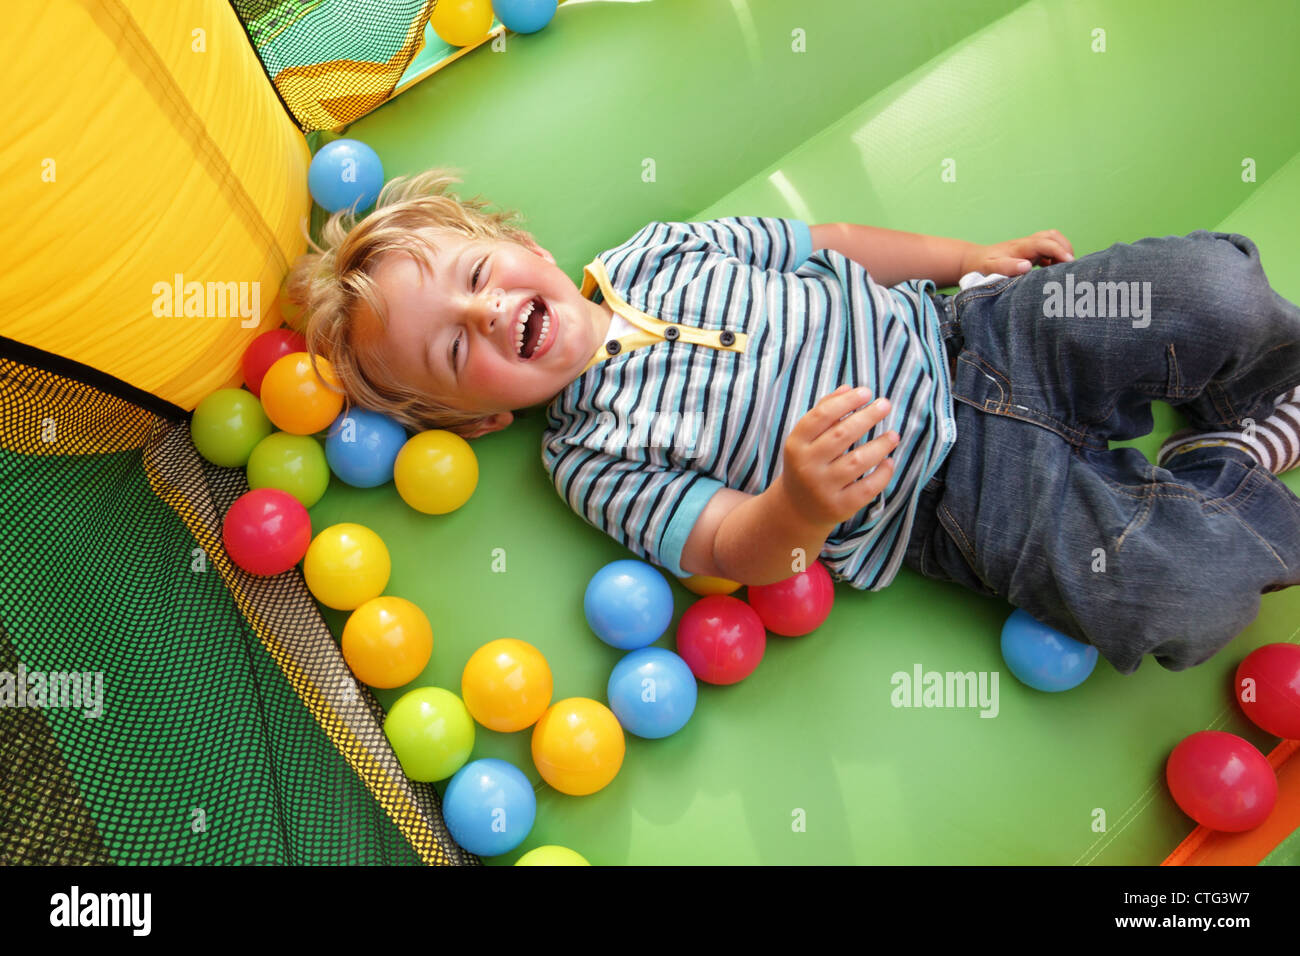 Kind auf aufblasbare Hüpfburg Stockbild